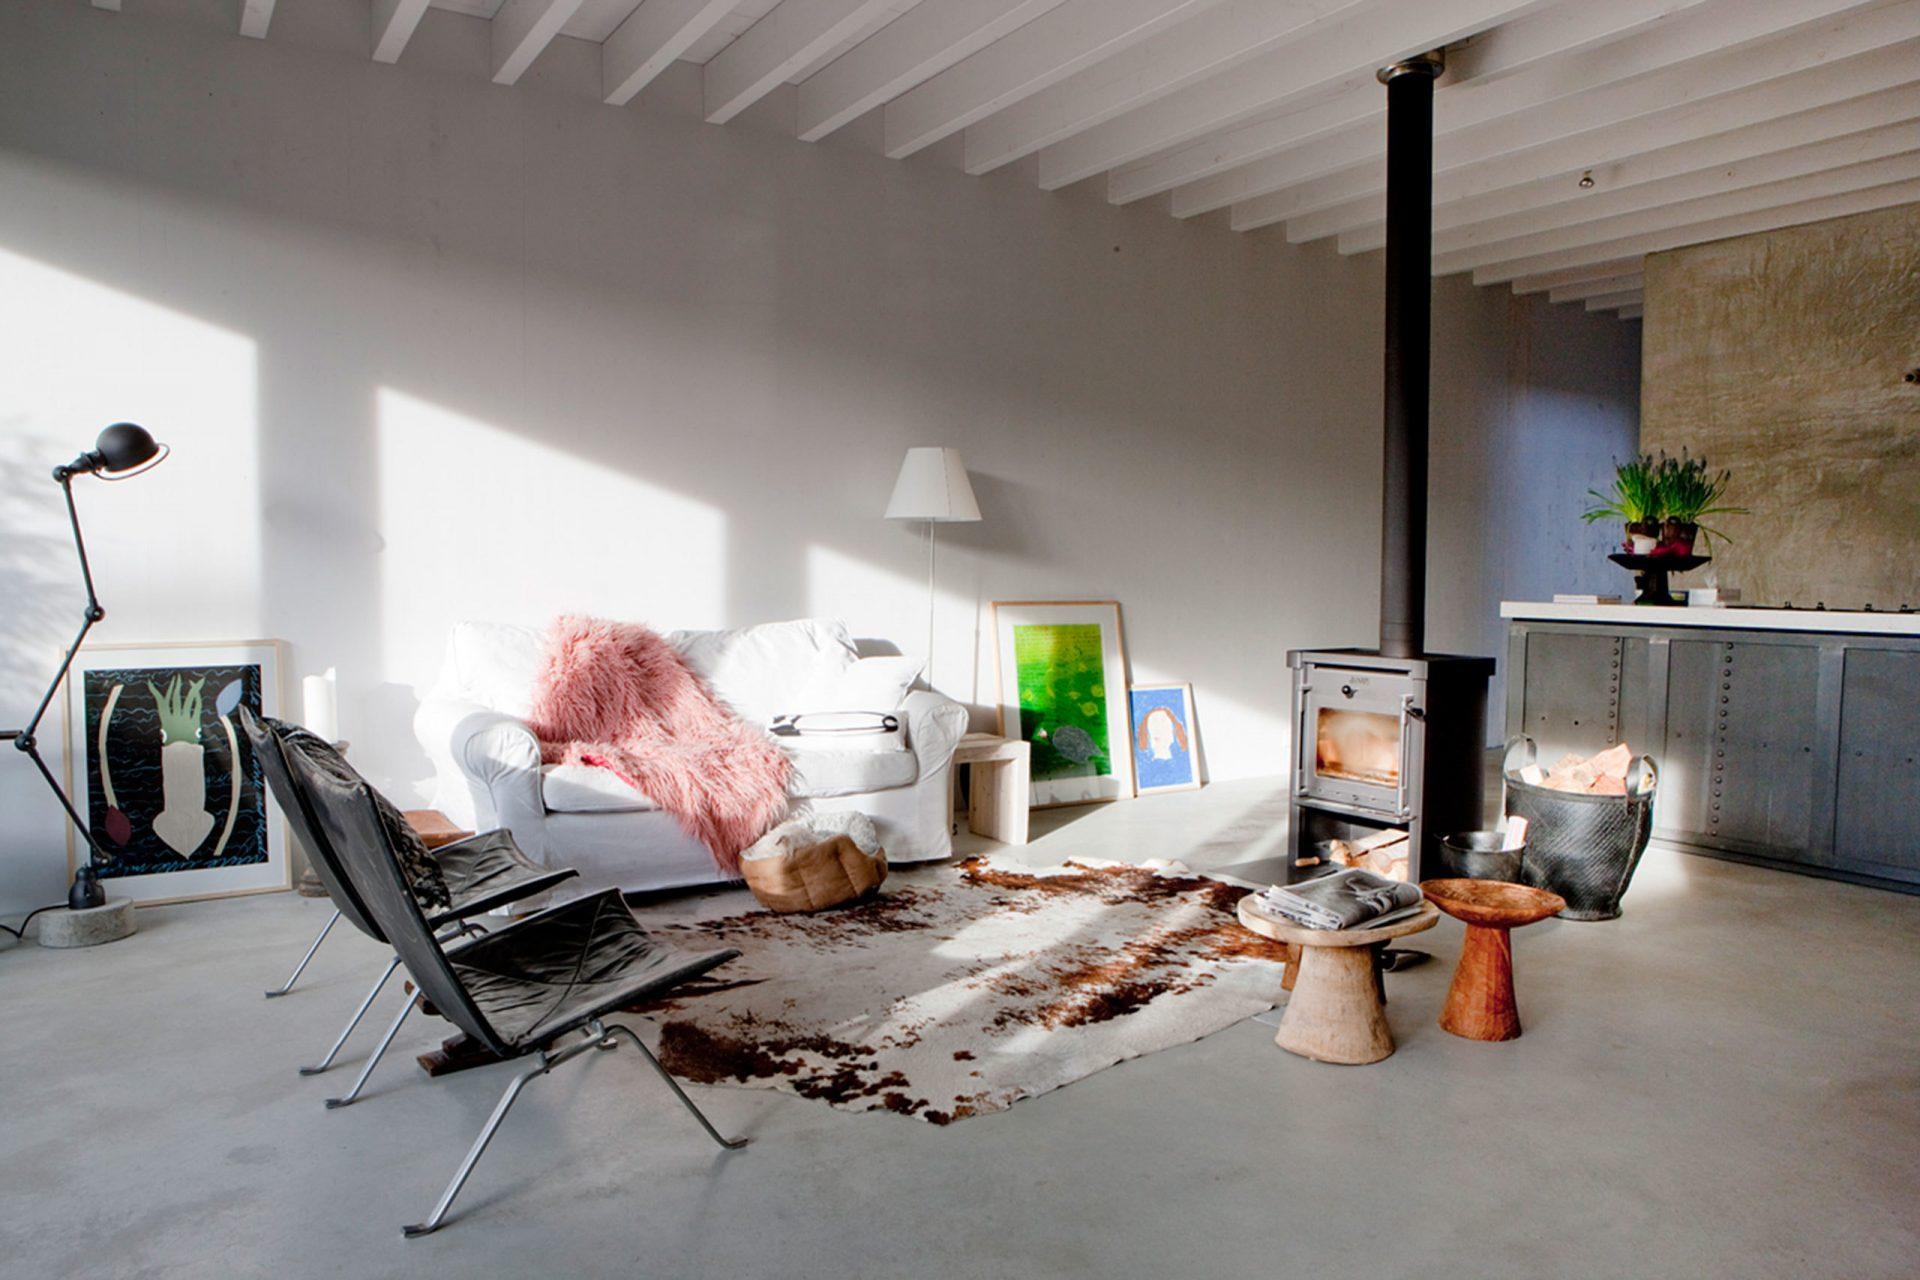 Rieteijland Living Room 2